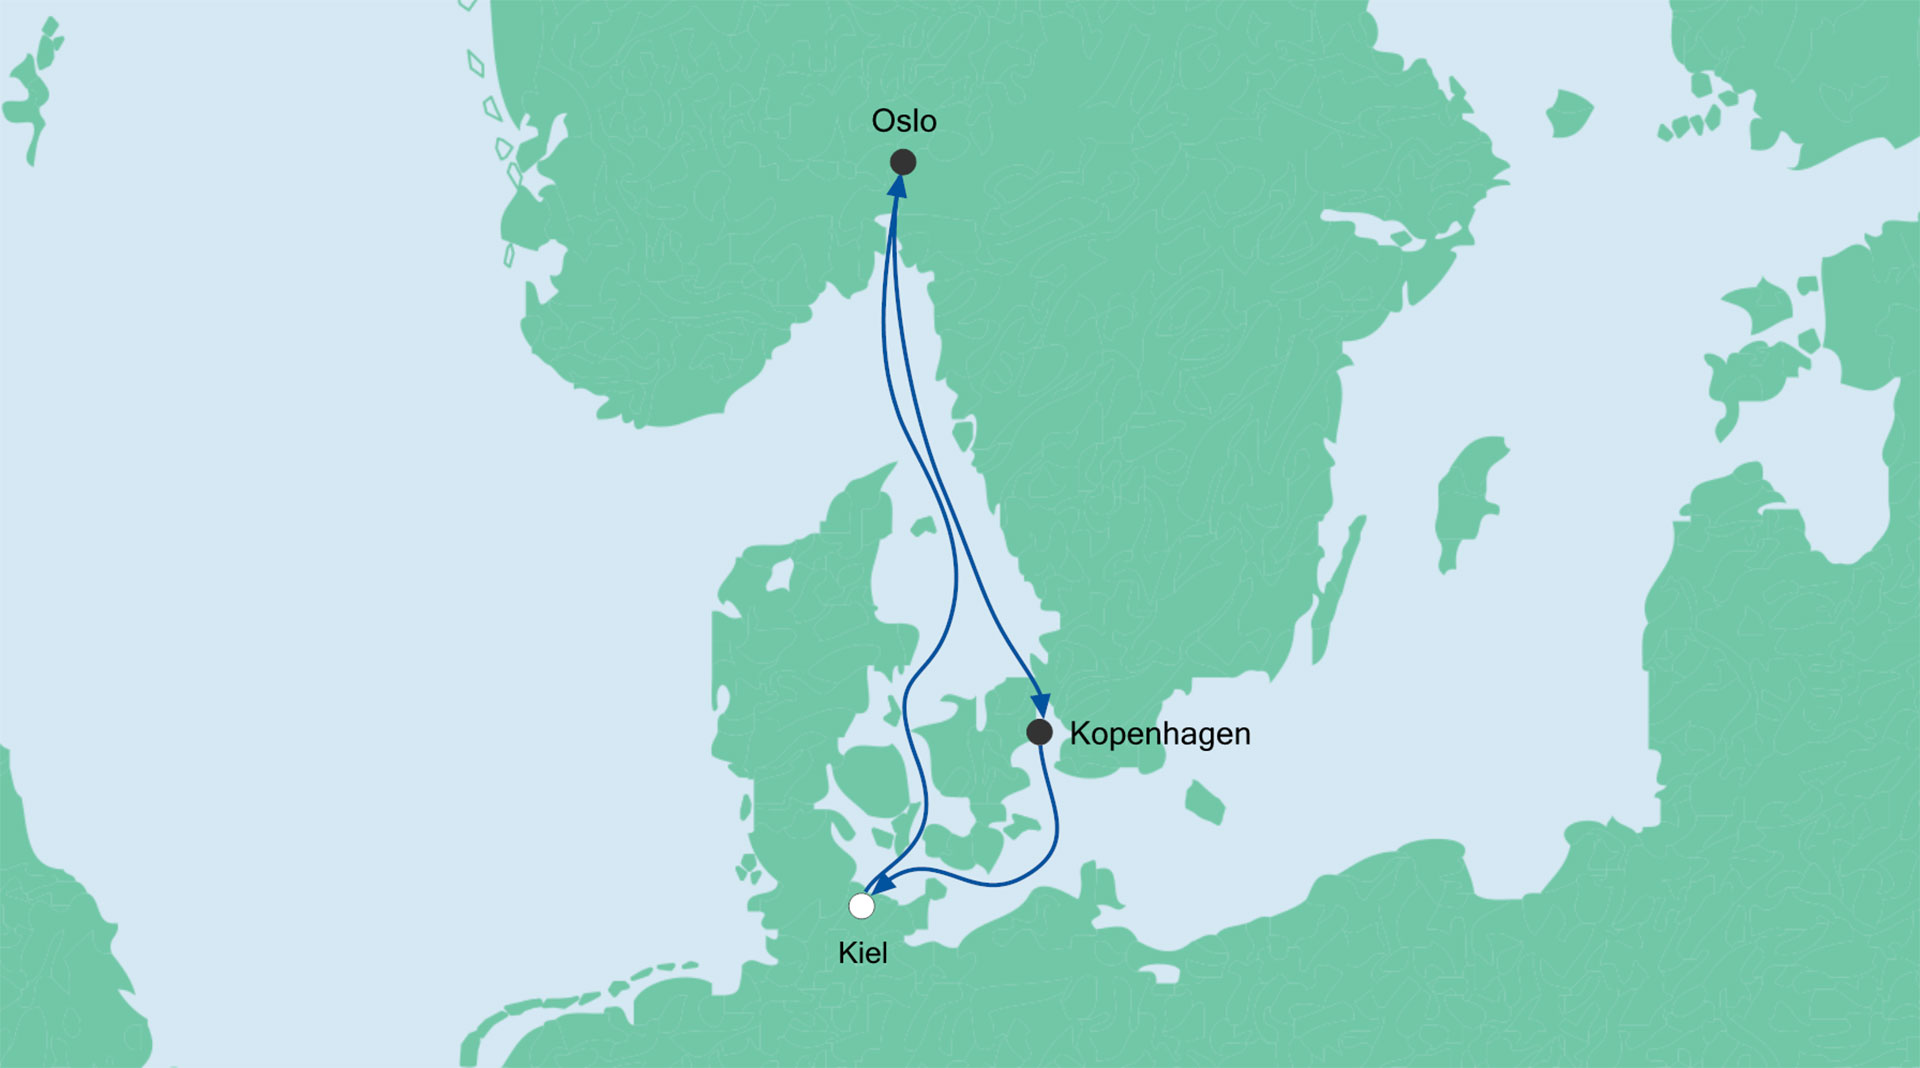 Routenkarte Kiel/Oslo/Kopenhagen